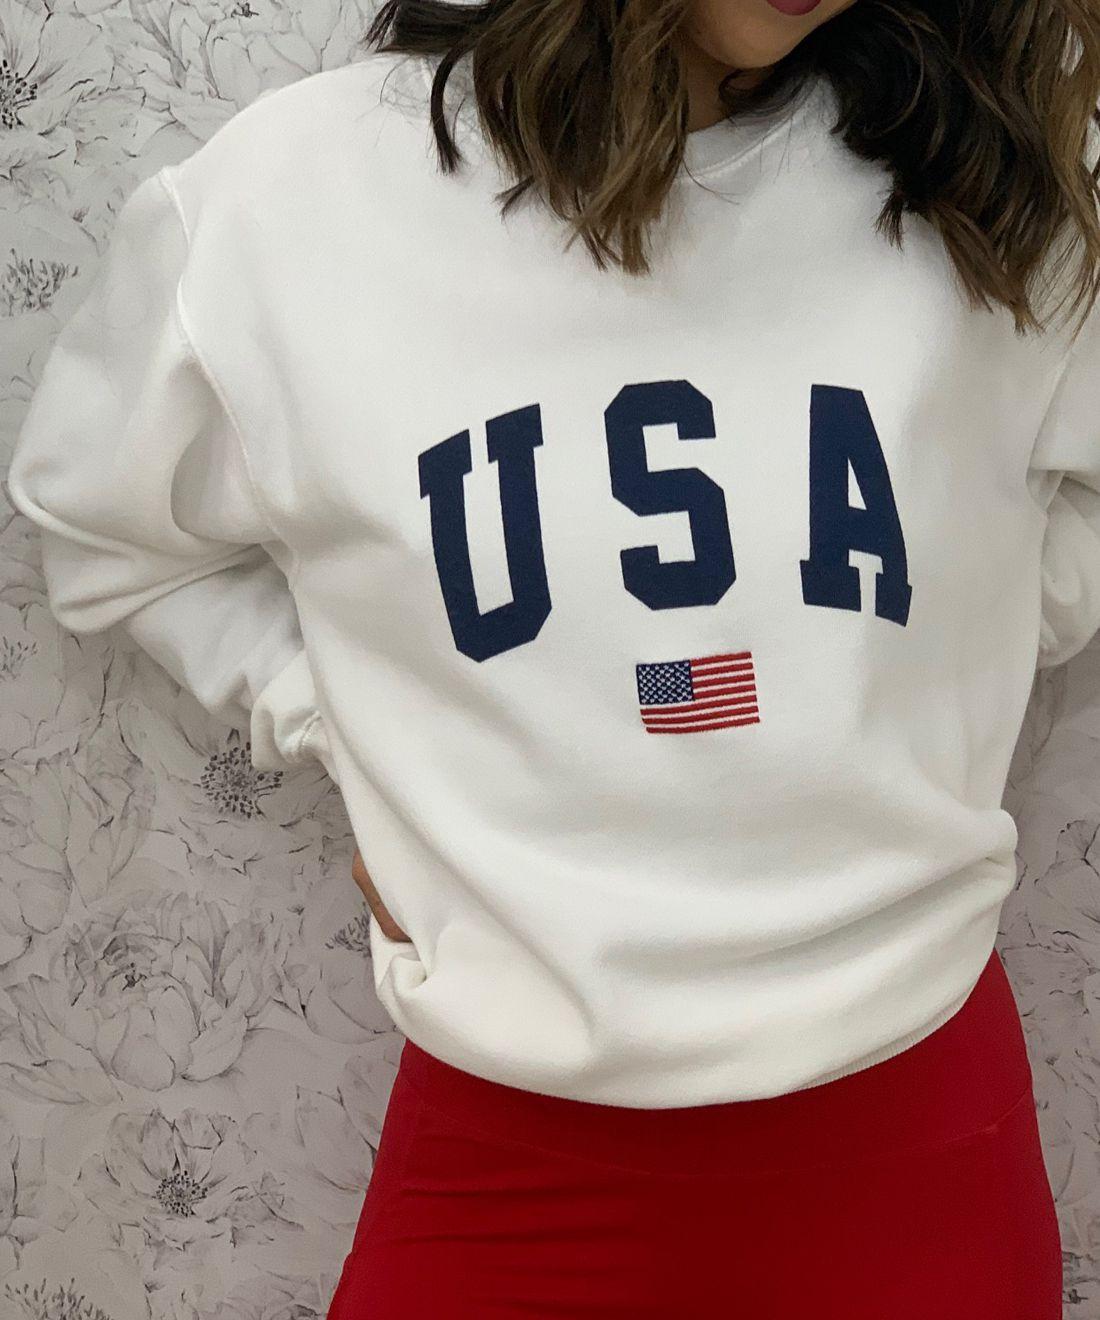 Peonies & Anemones White Floral Wallpaper • Girl with USA jumper in front of White Floral Wallpaper